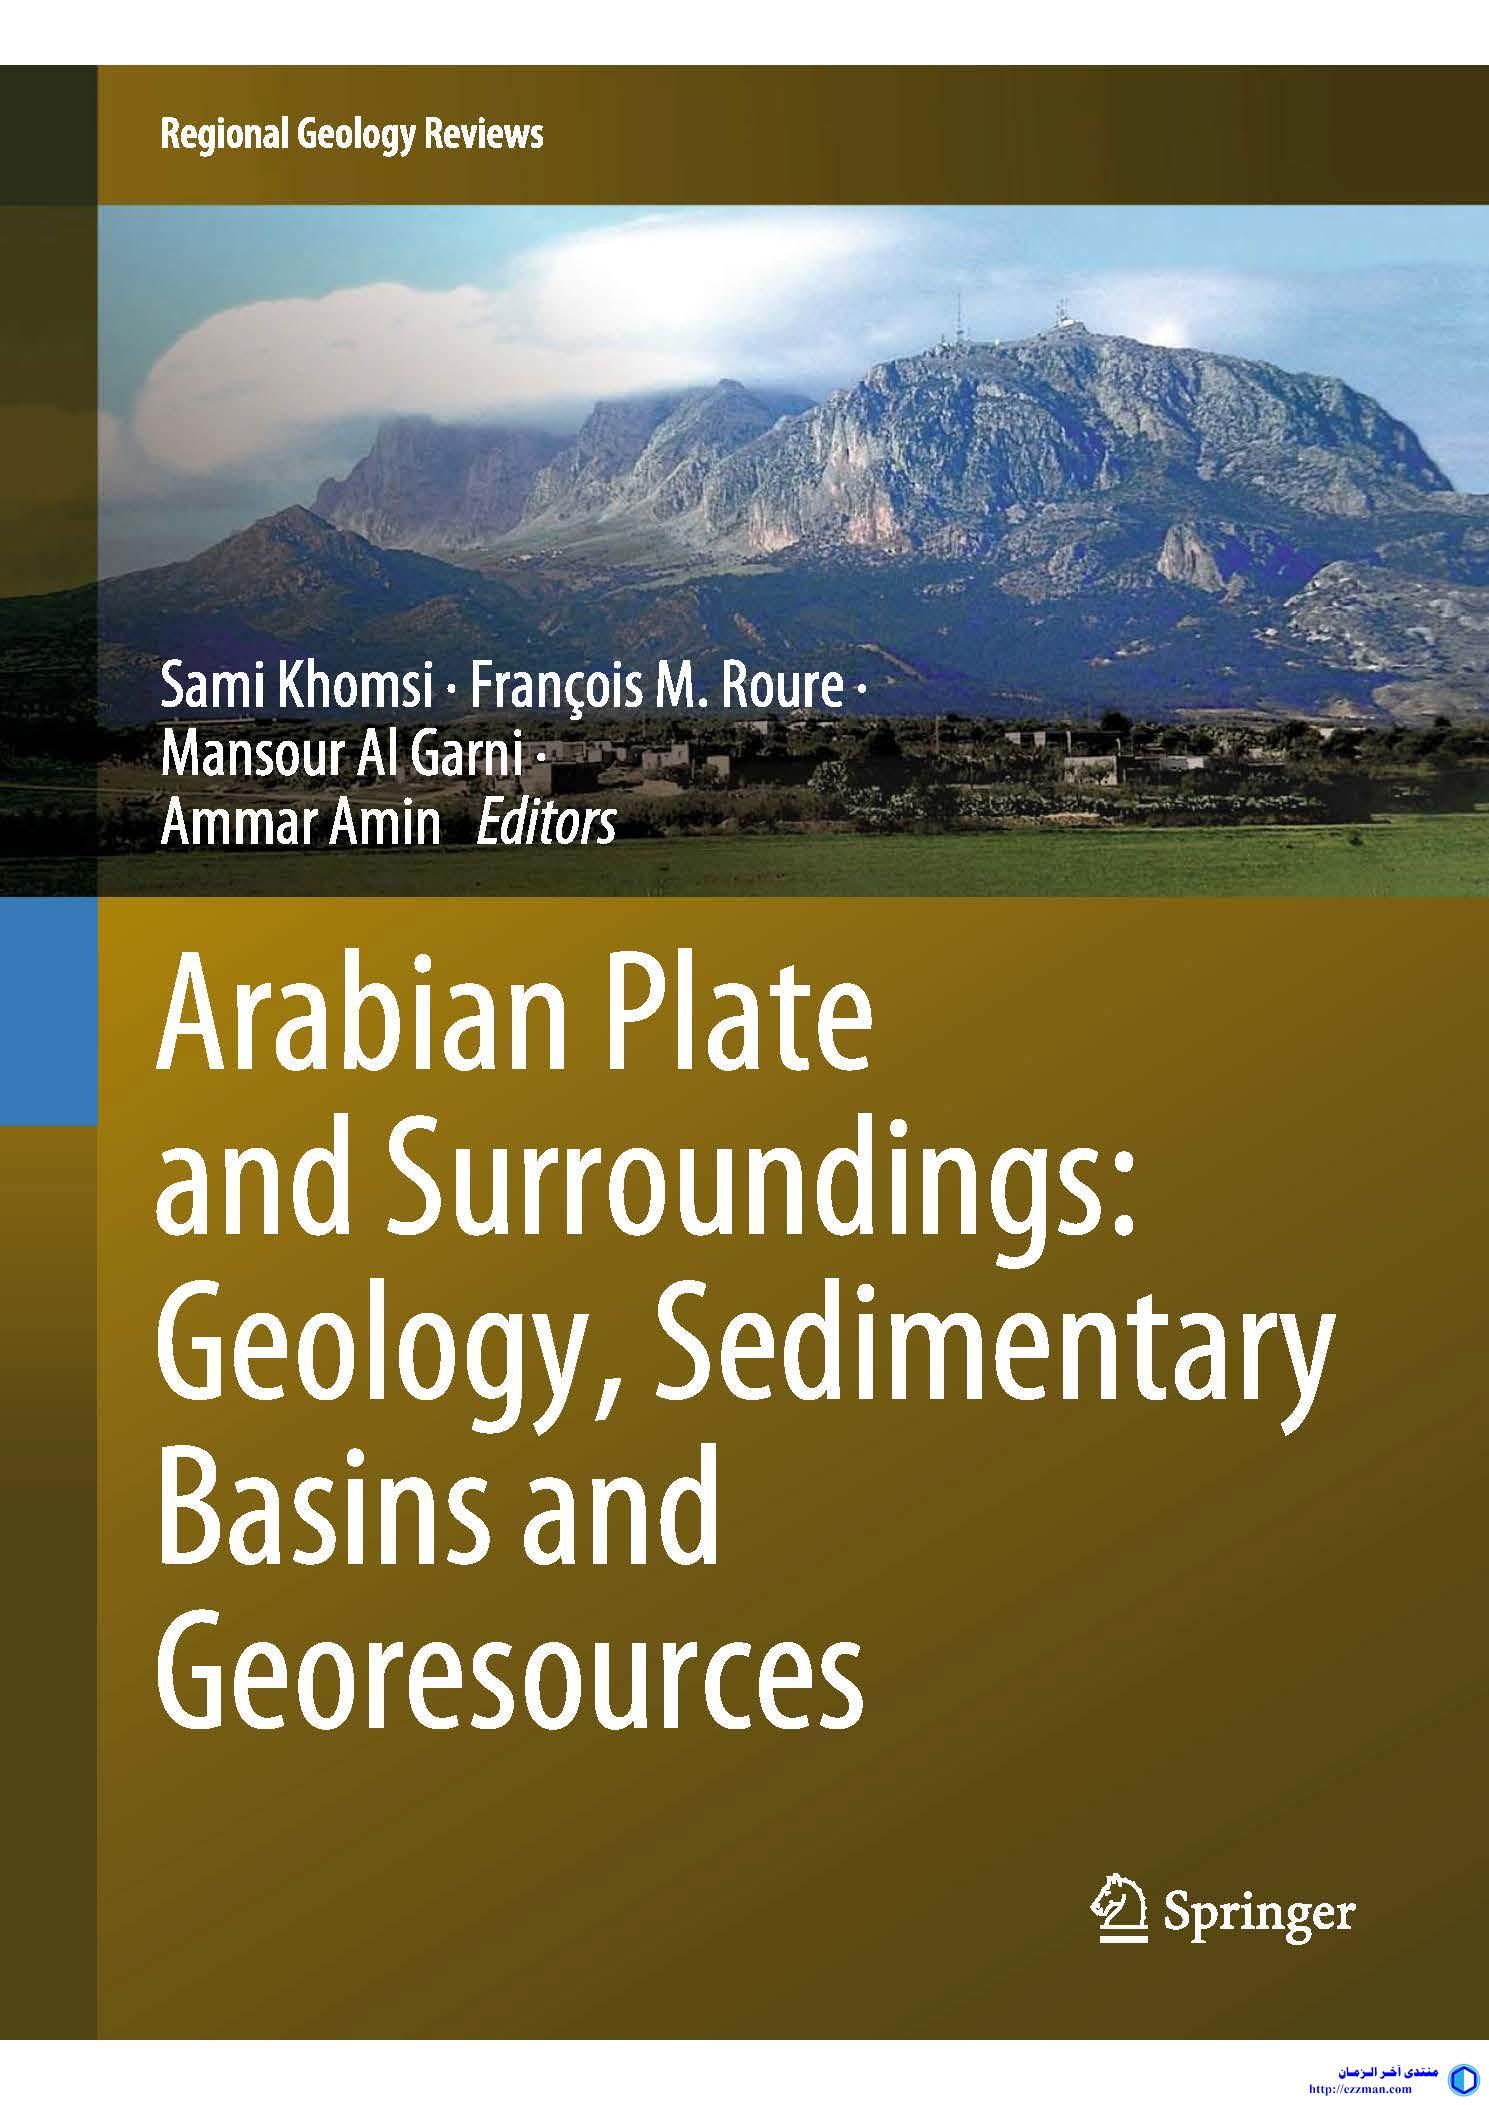 Arabian Plate Surroundings Geology, Sedimentary